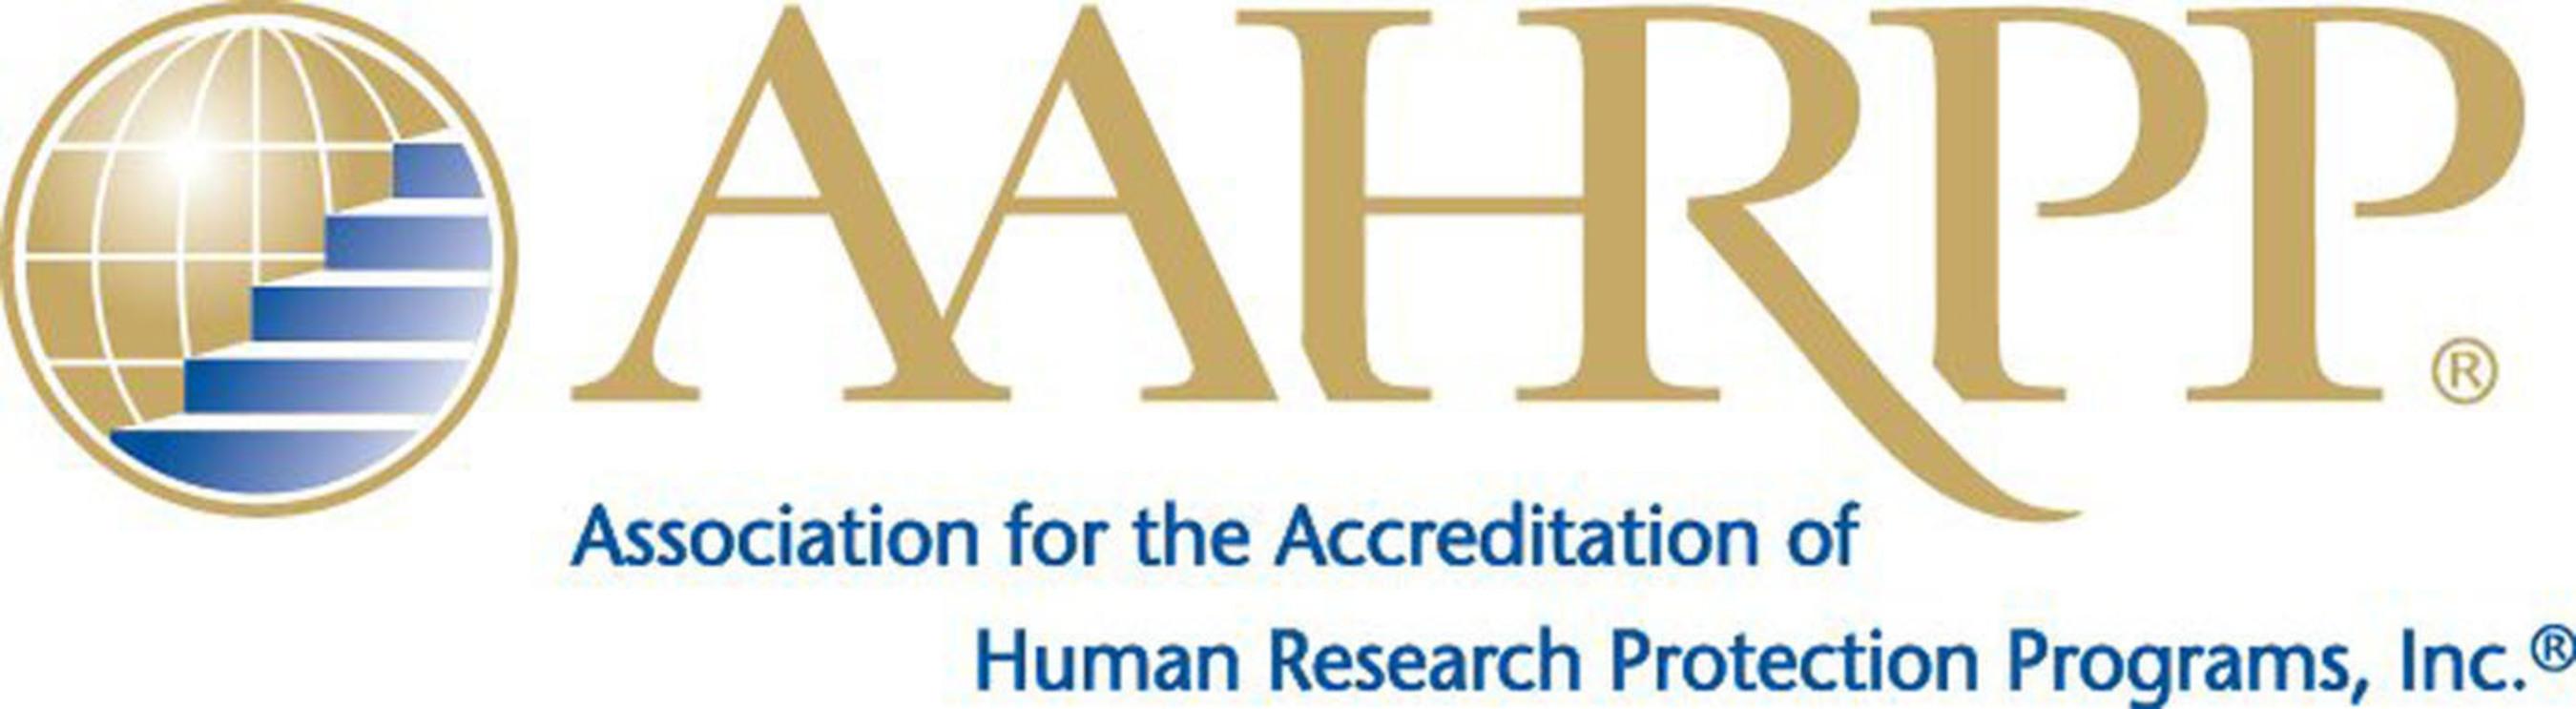 AAHRPP akkreditiert die ersten Organisationen in Europa